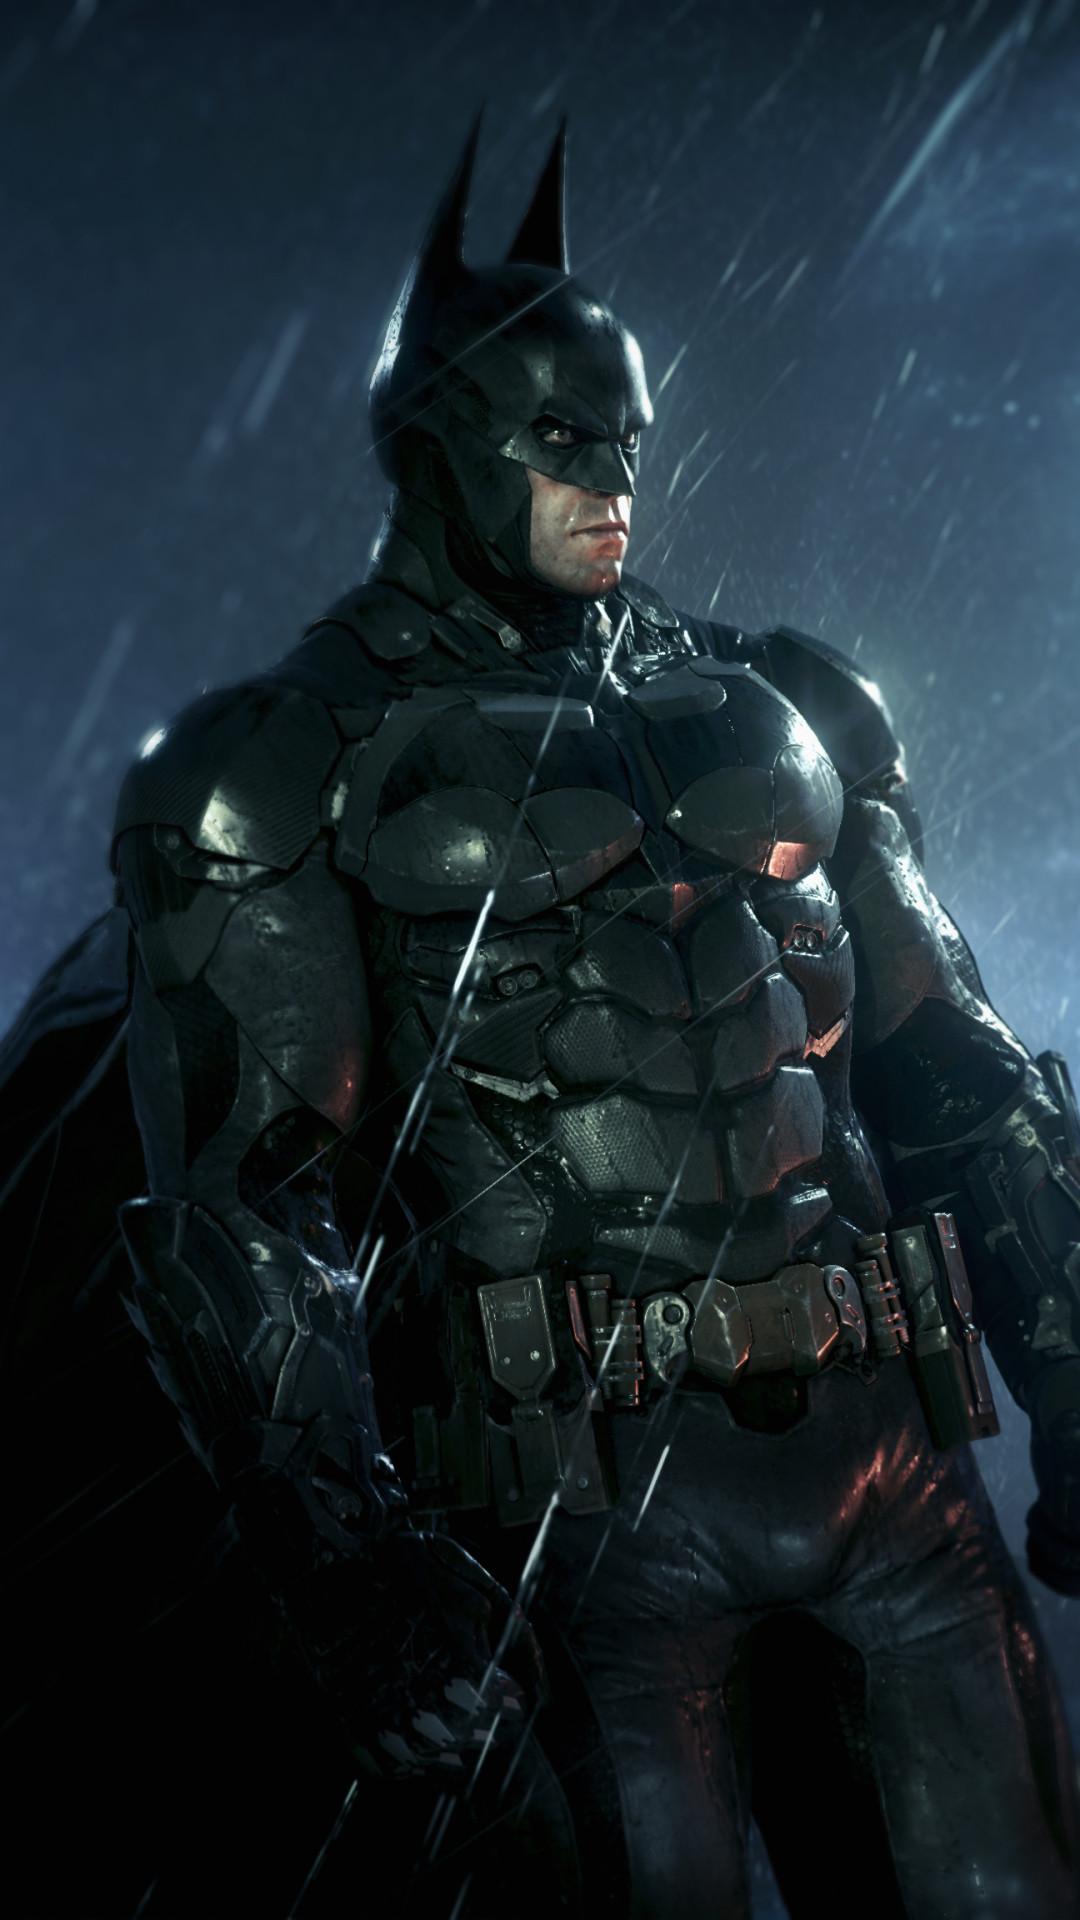 Batman Arkham Knight Wallpapers (80+ images)